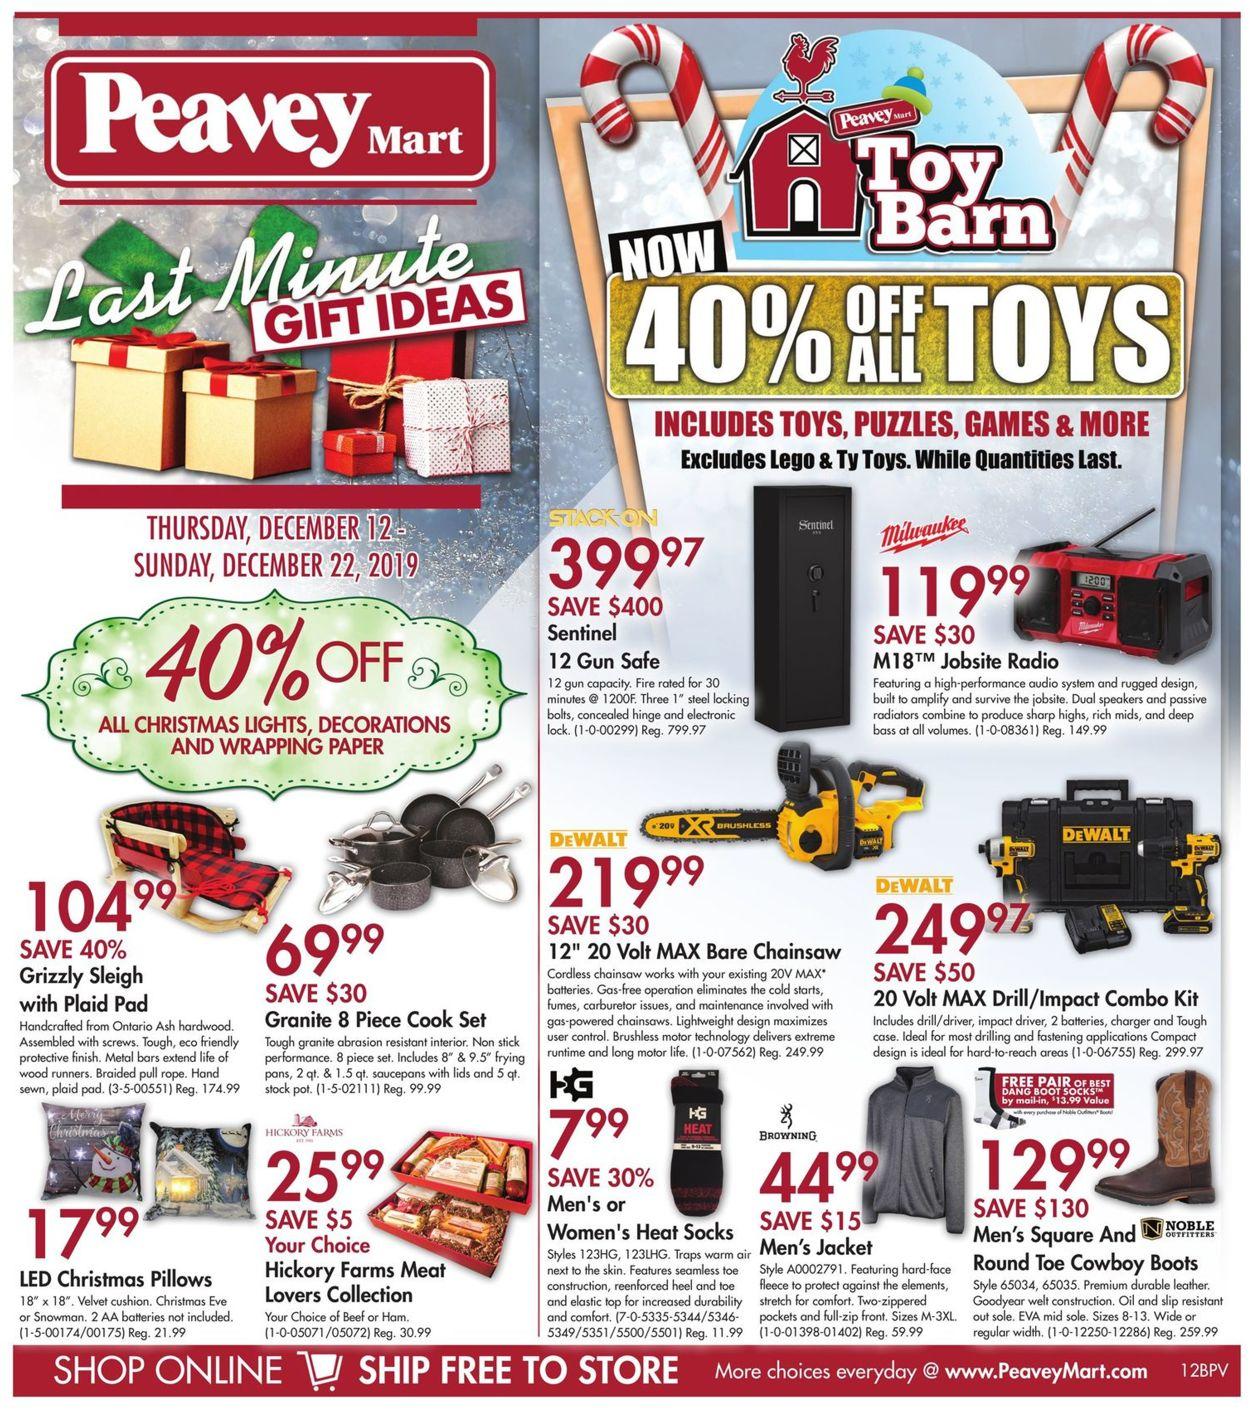 Peavey Mart CHRISTMAS GIFT IDEAS 2019 Flyer - 12/12-12/22/2019